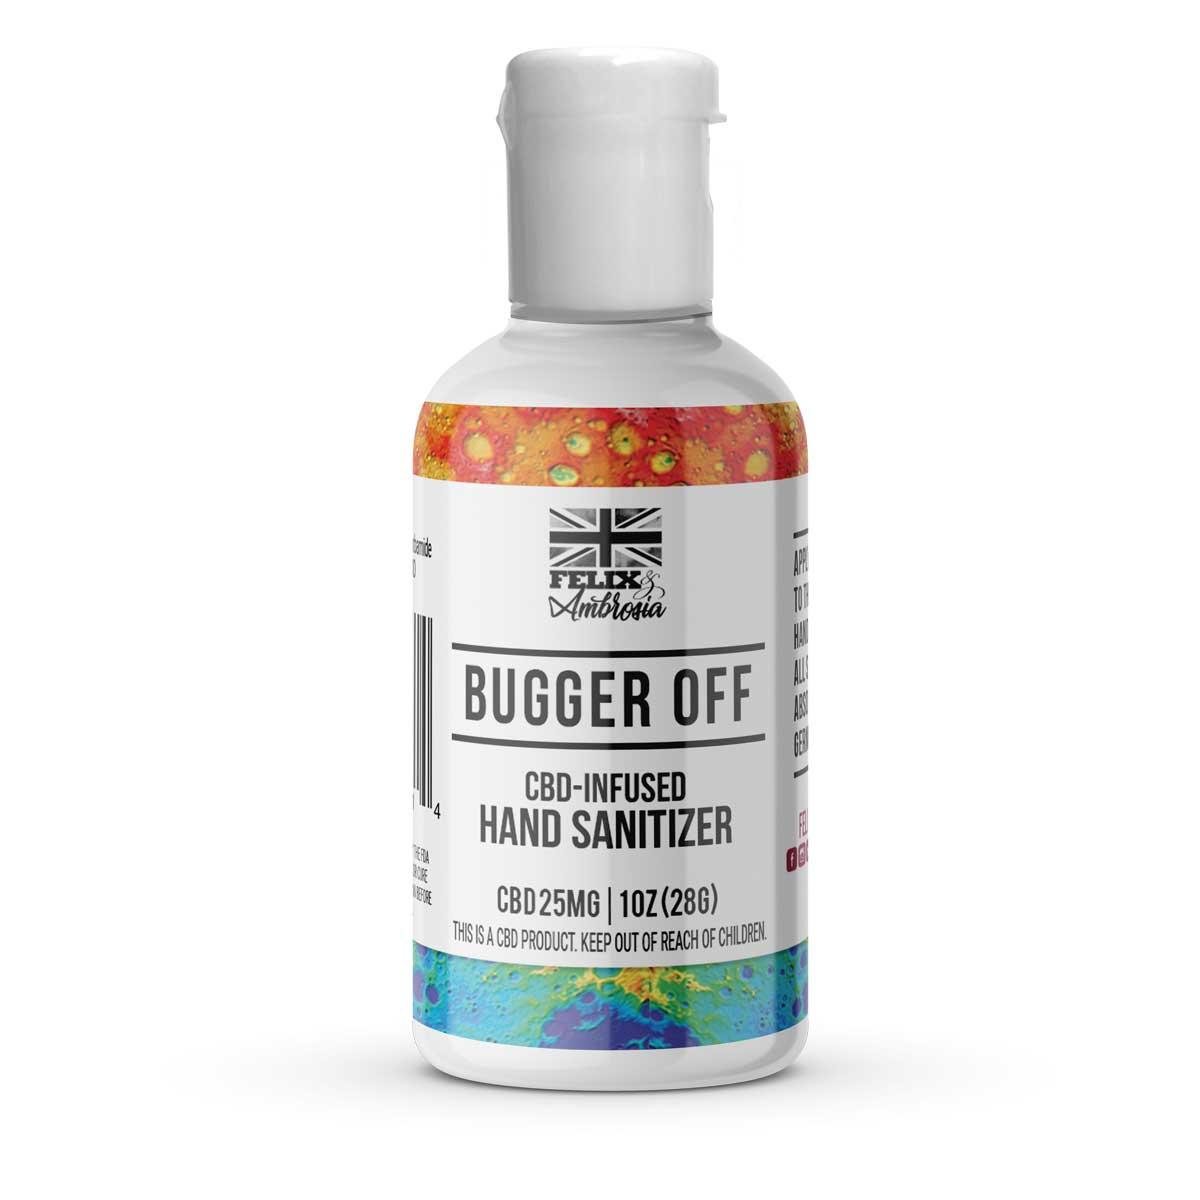 Bugger Off CBD Hand Sanitizer